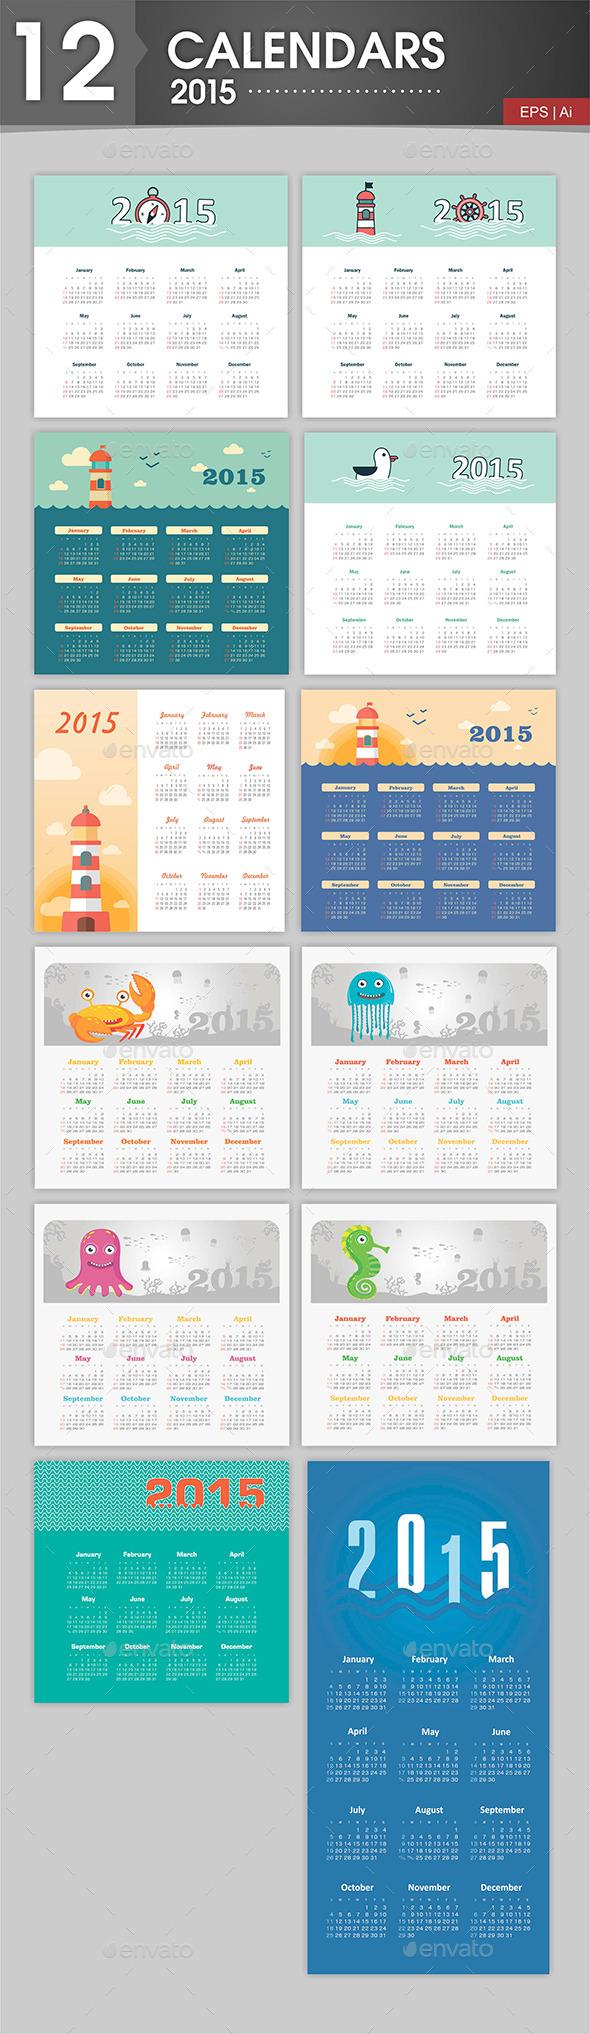 12 Calendars 2015 Marine Theme